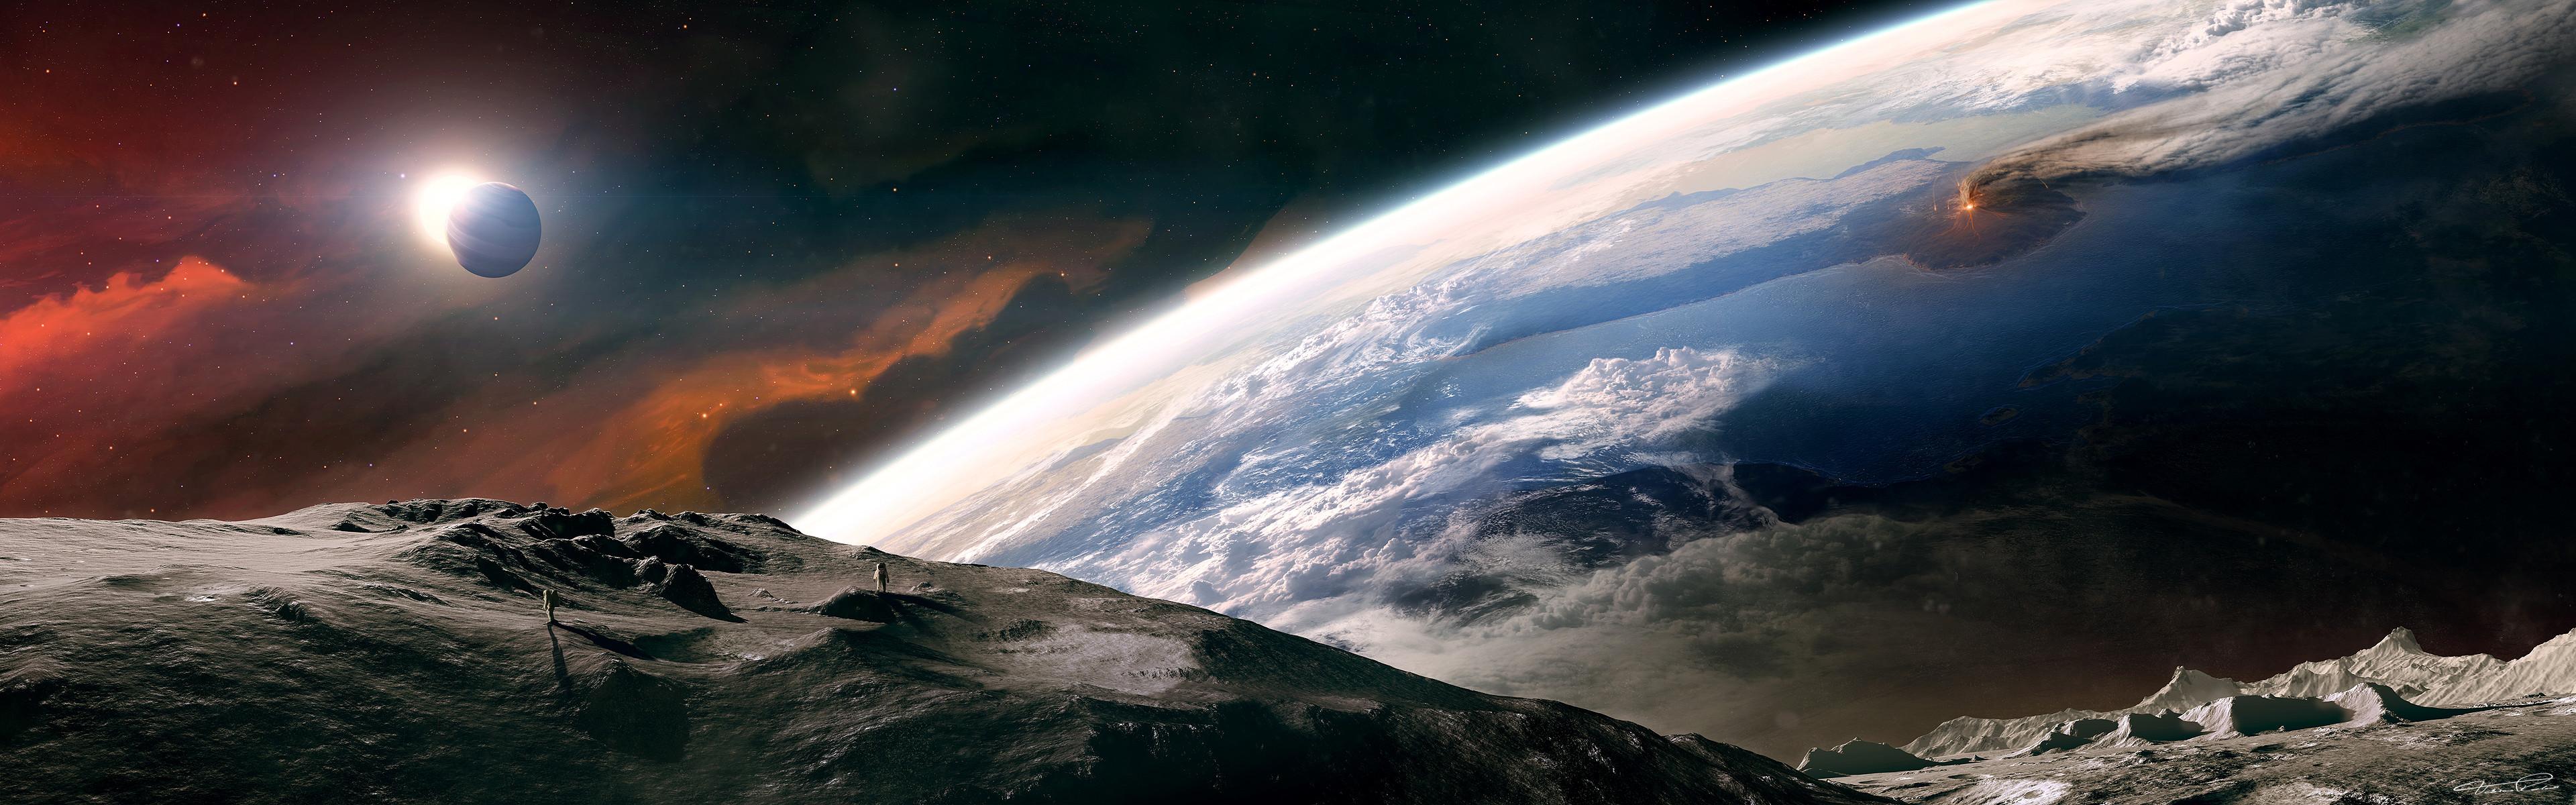 3d Space Scene Dual Screen Wallpaper #157366 – Resolution px